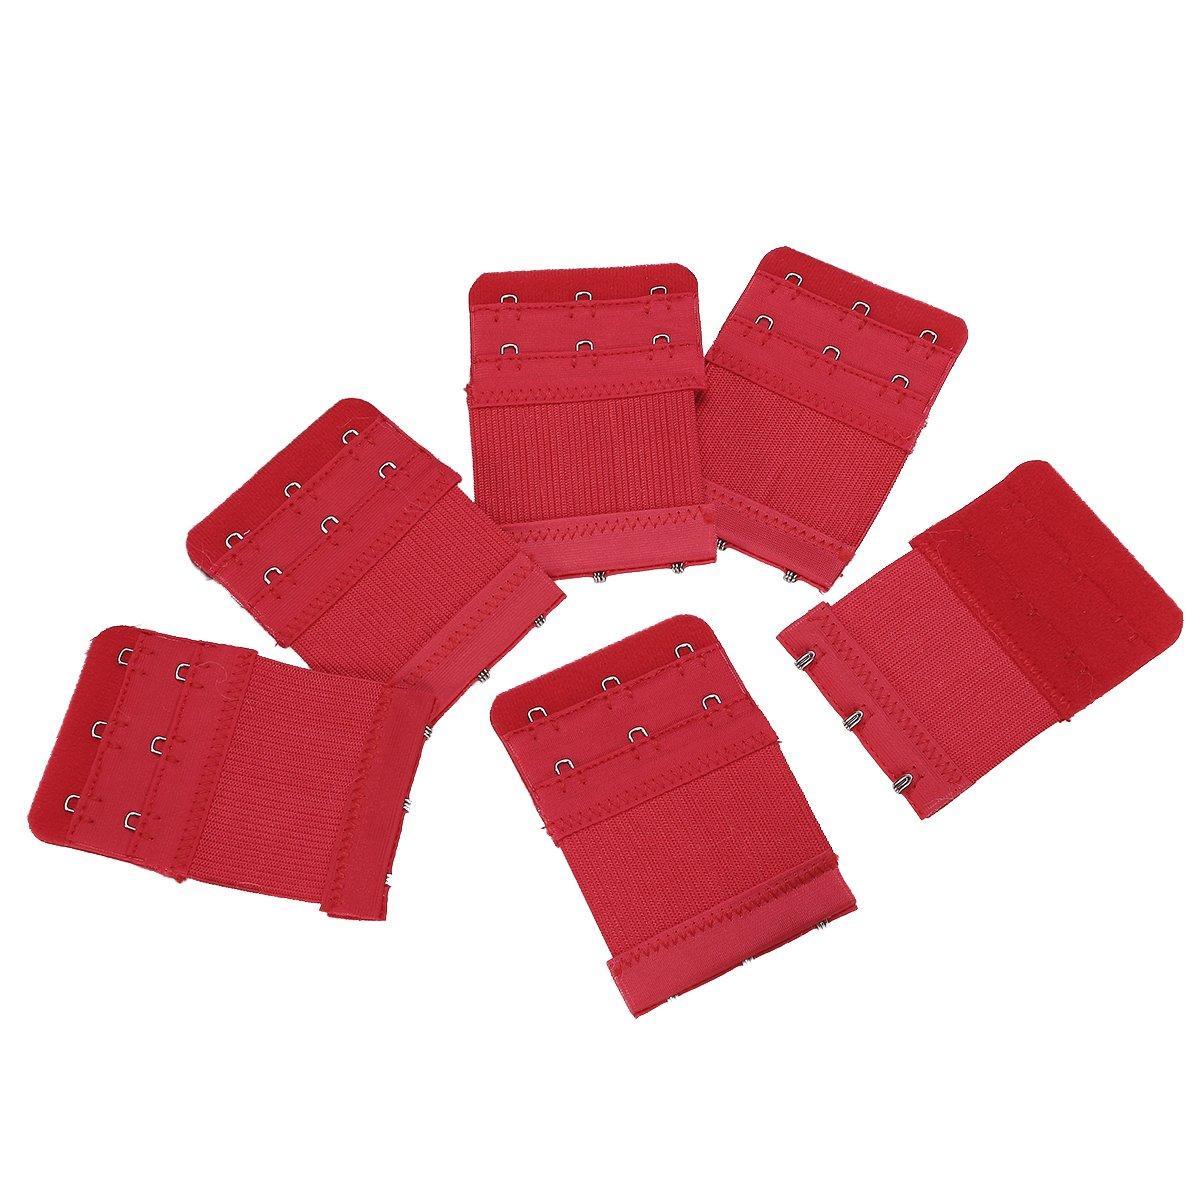 KissLace Women Straps Elastic Bra Extenders Accessories Flexible Comfortable Hooks Extension KISSLACEjinnmyuk2048